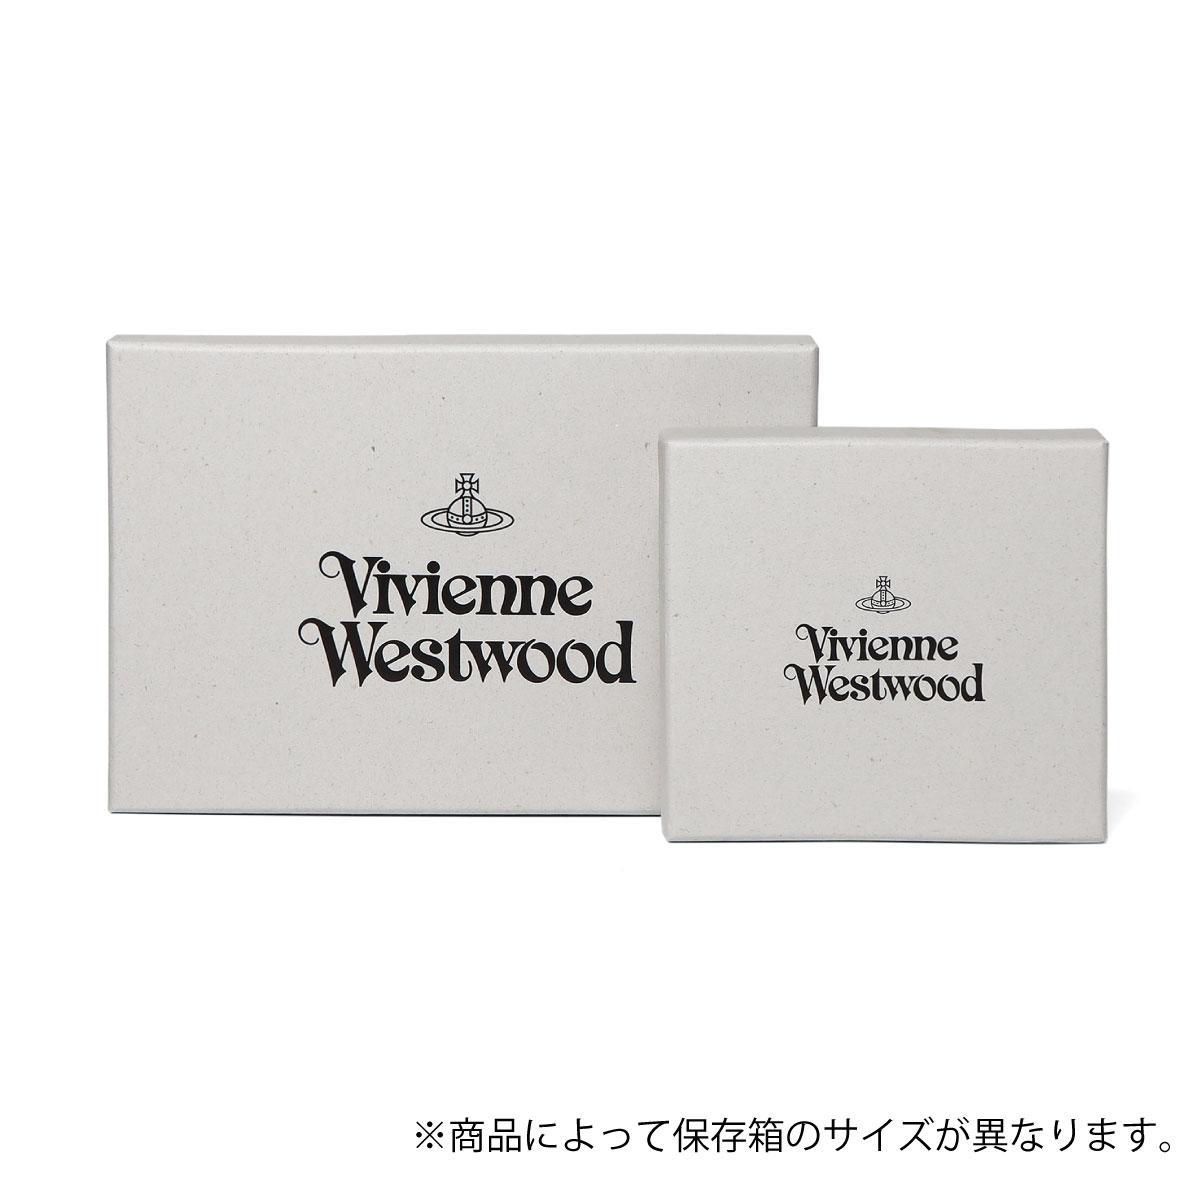 VIVIENNE WESTWOOD ヴィヴィアン ウエストウッド | 三つ折り財布 | VICTORIA ヴィクトリア